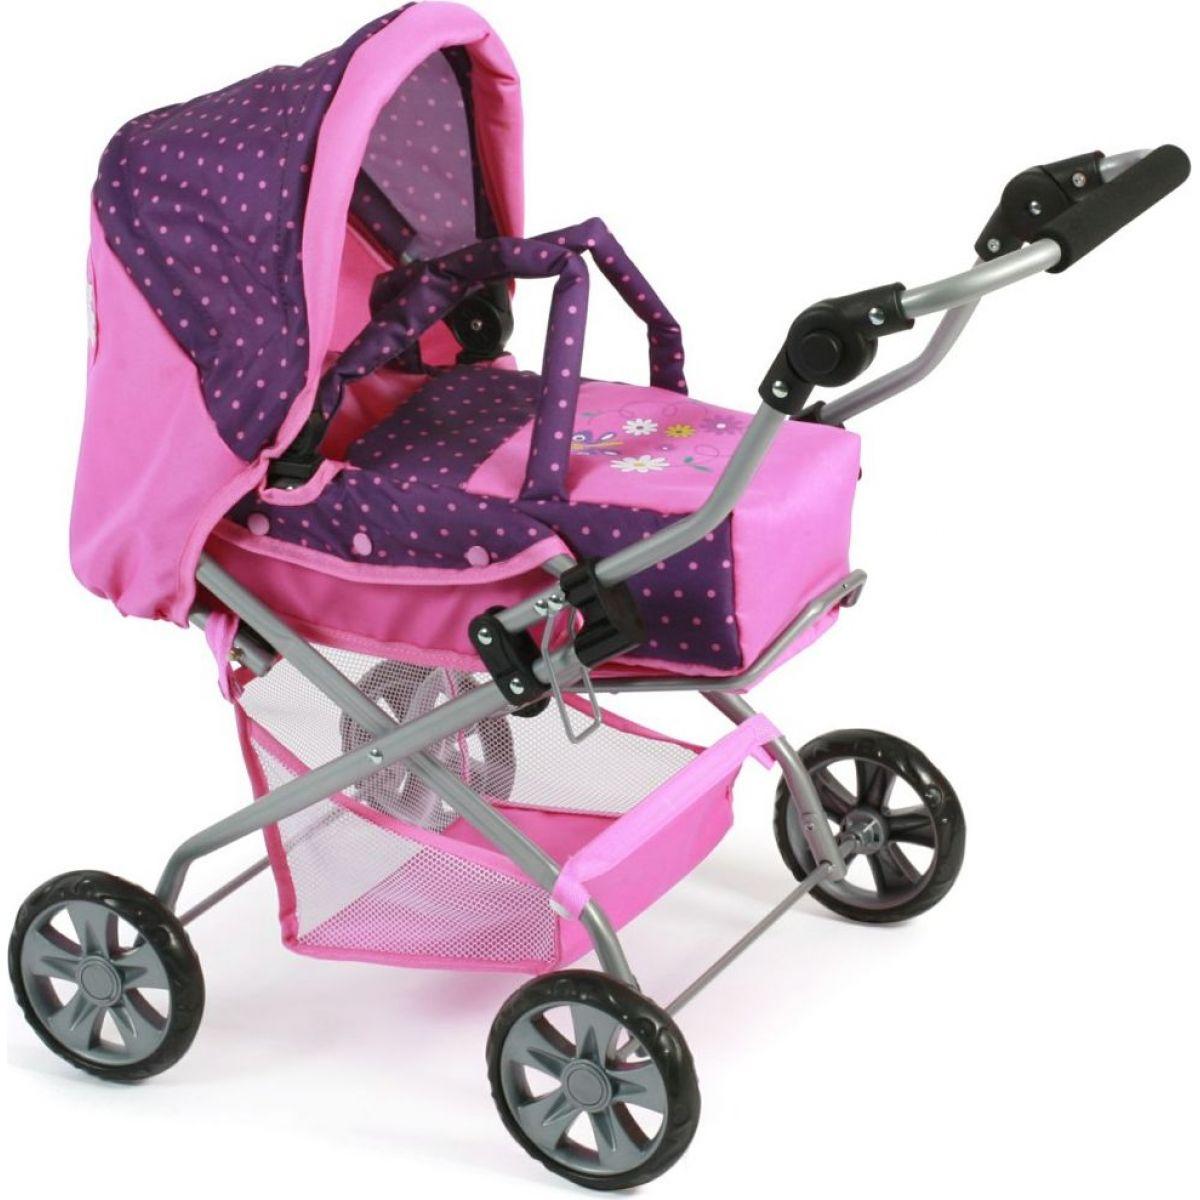 Bayer Chic Piccolino Dots purple pink